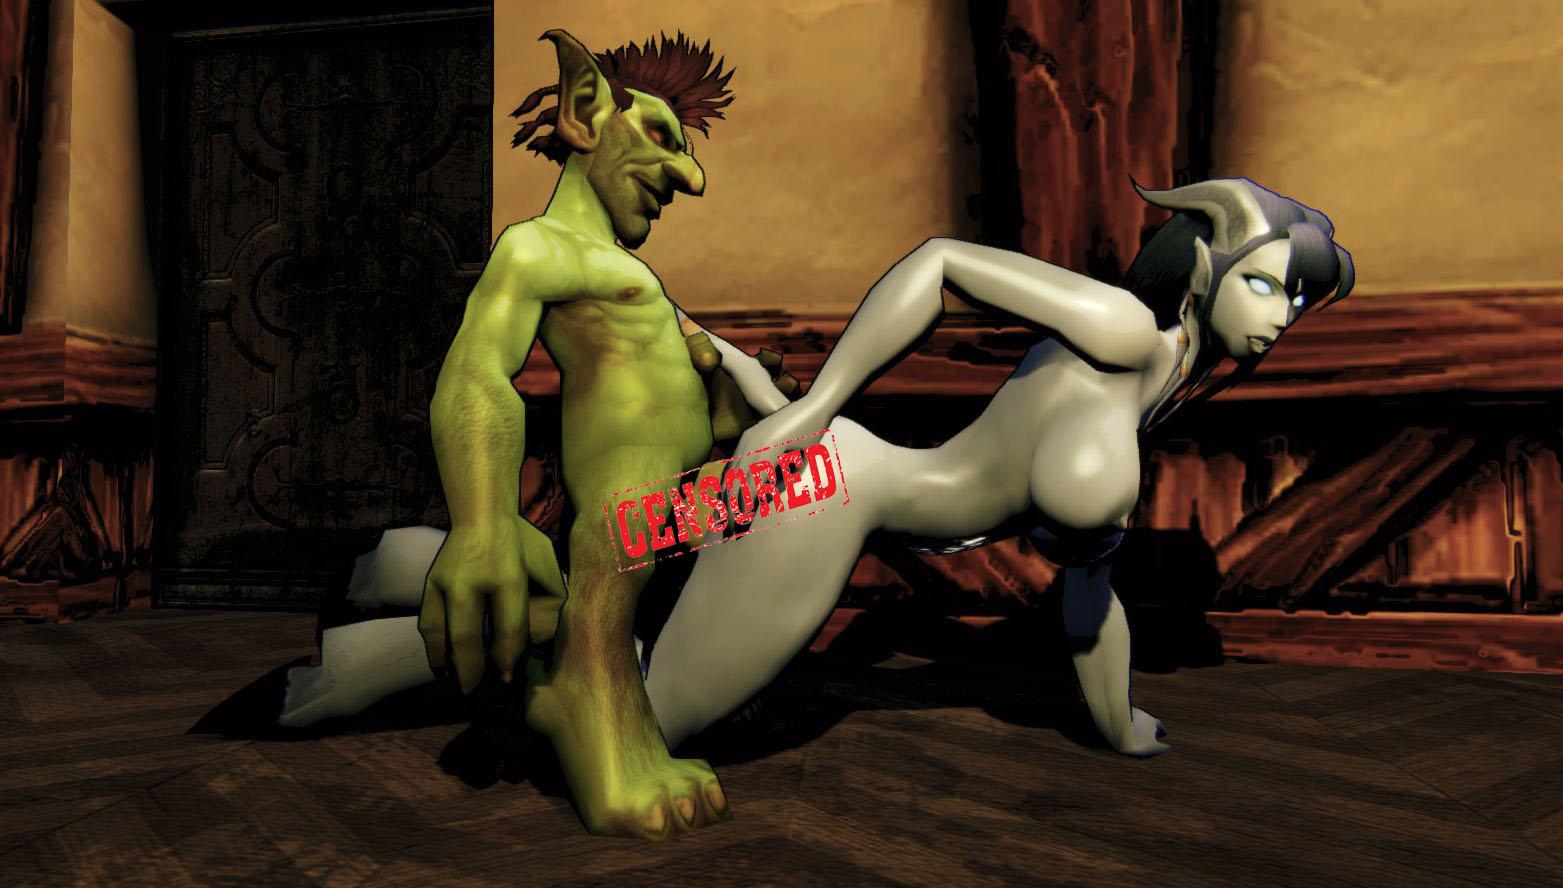 World extream nude pics porn scenes